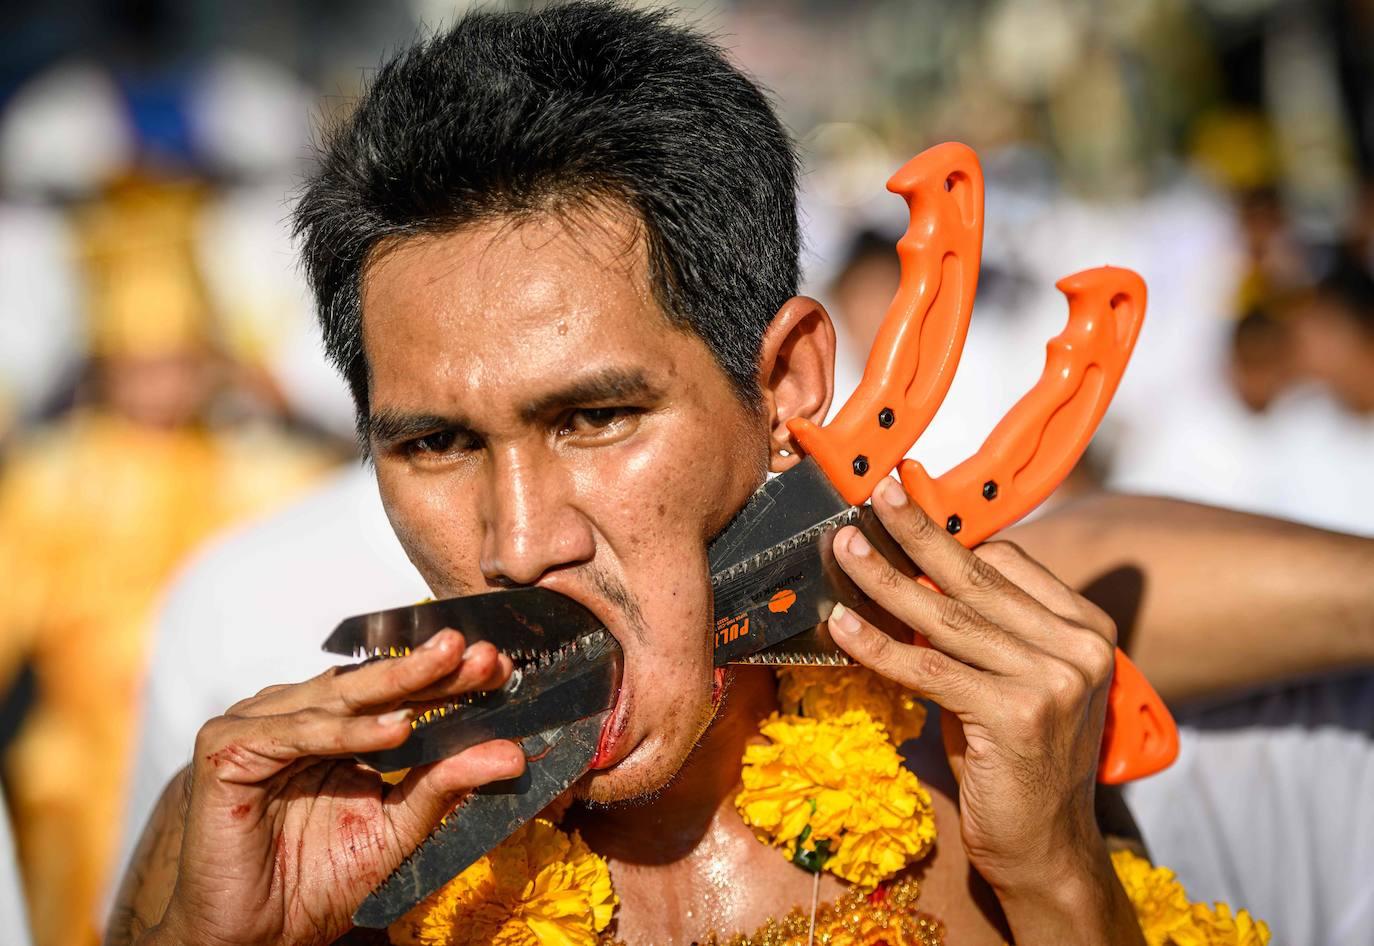 El Festival Vegetariano de Phuket deja imágenes impactantes